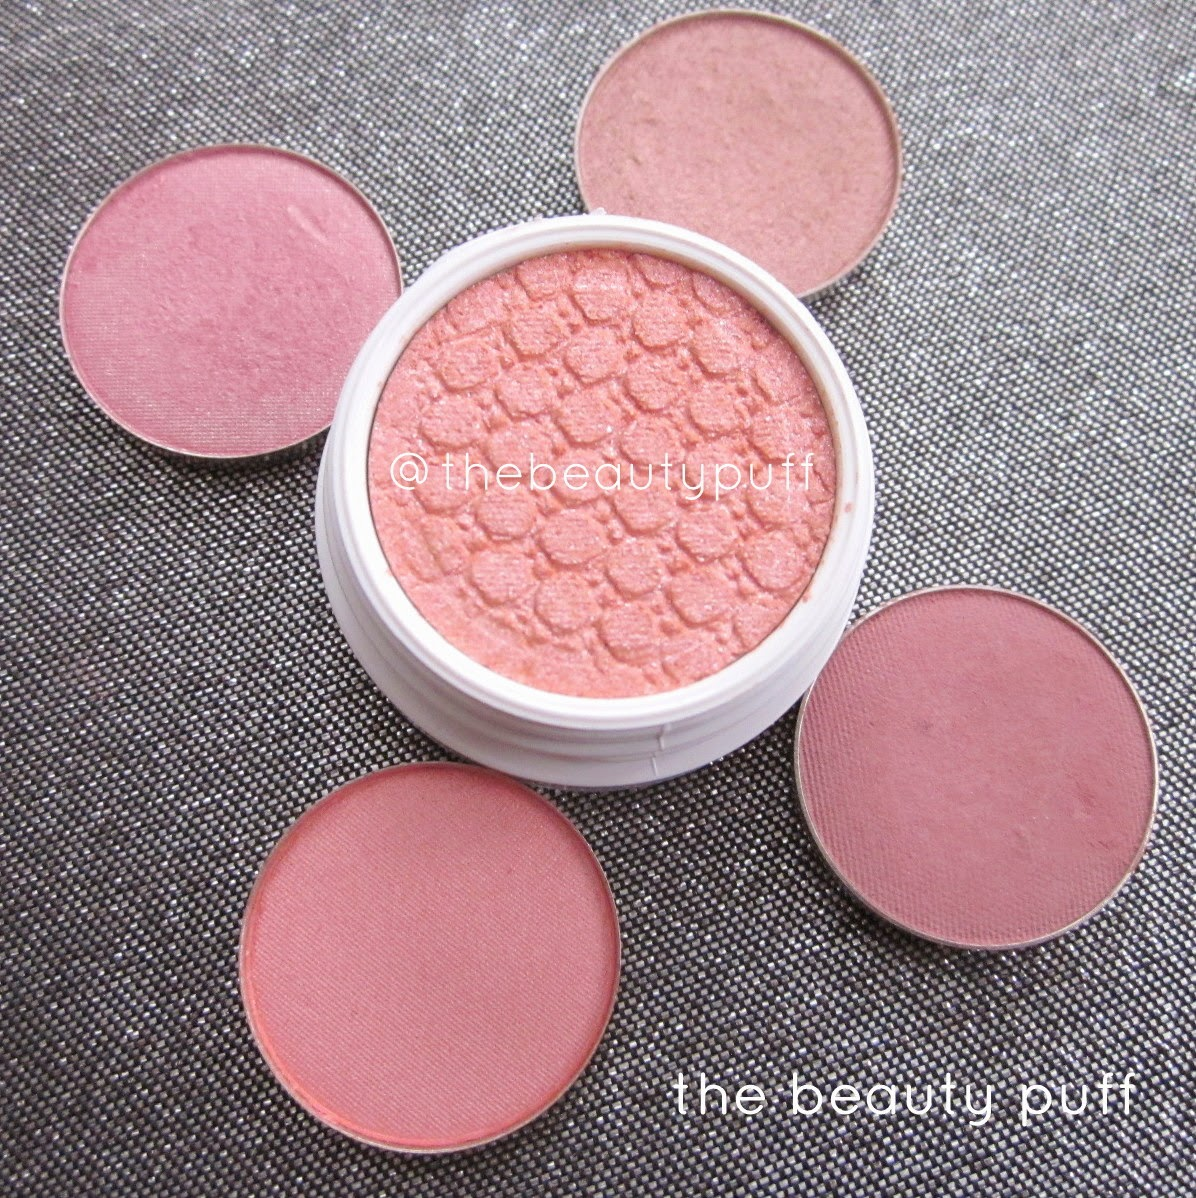 pink eyeshadows - the beauty puff